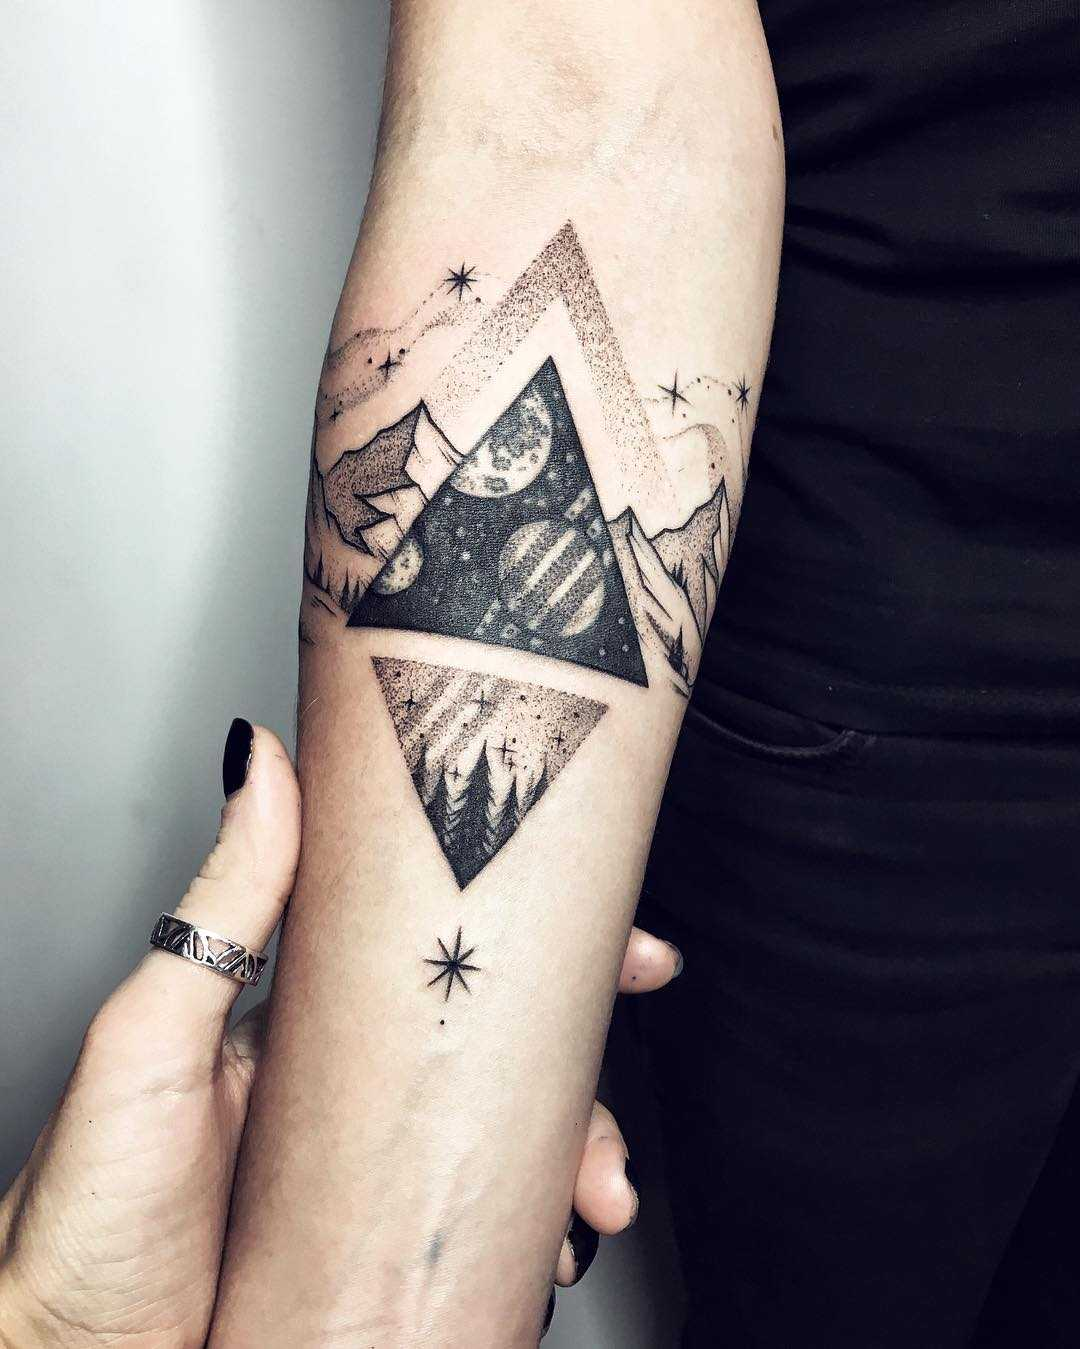 Cosmic triangle tattoo by Sasha Tattooing